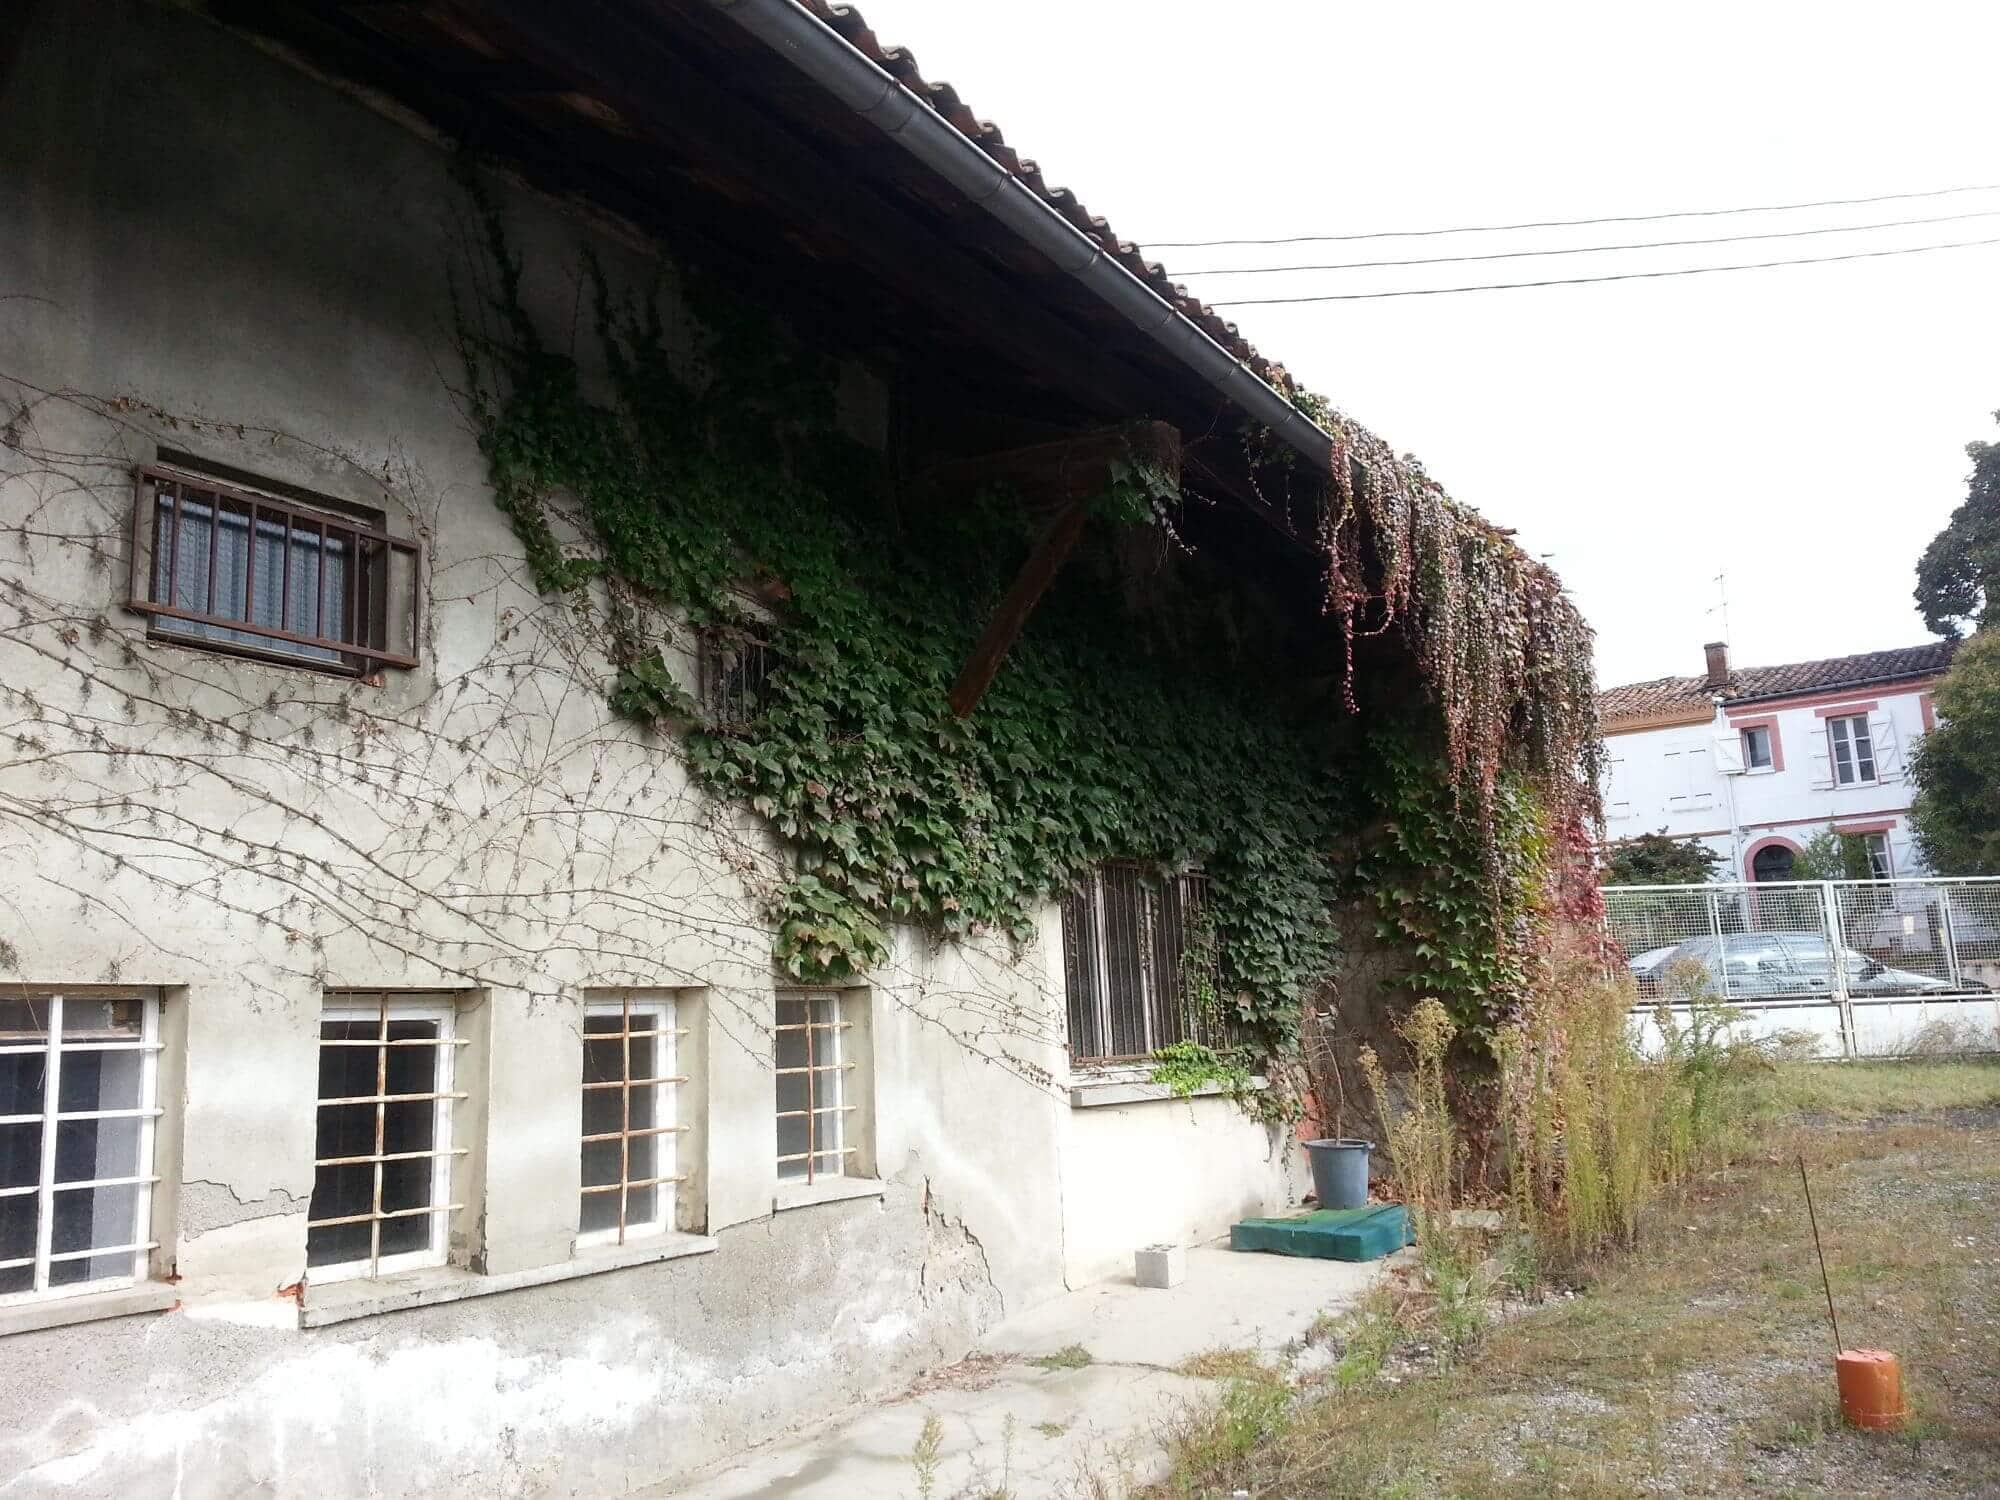 Jardin, Maison, Cote Pavee, Avant rénovation